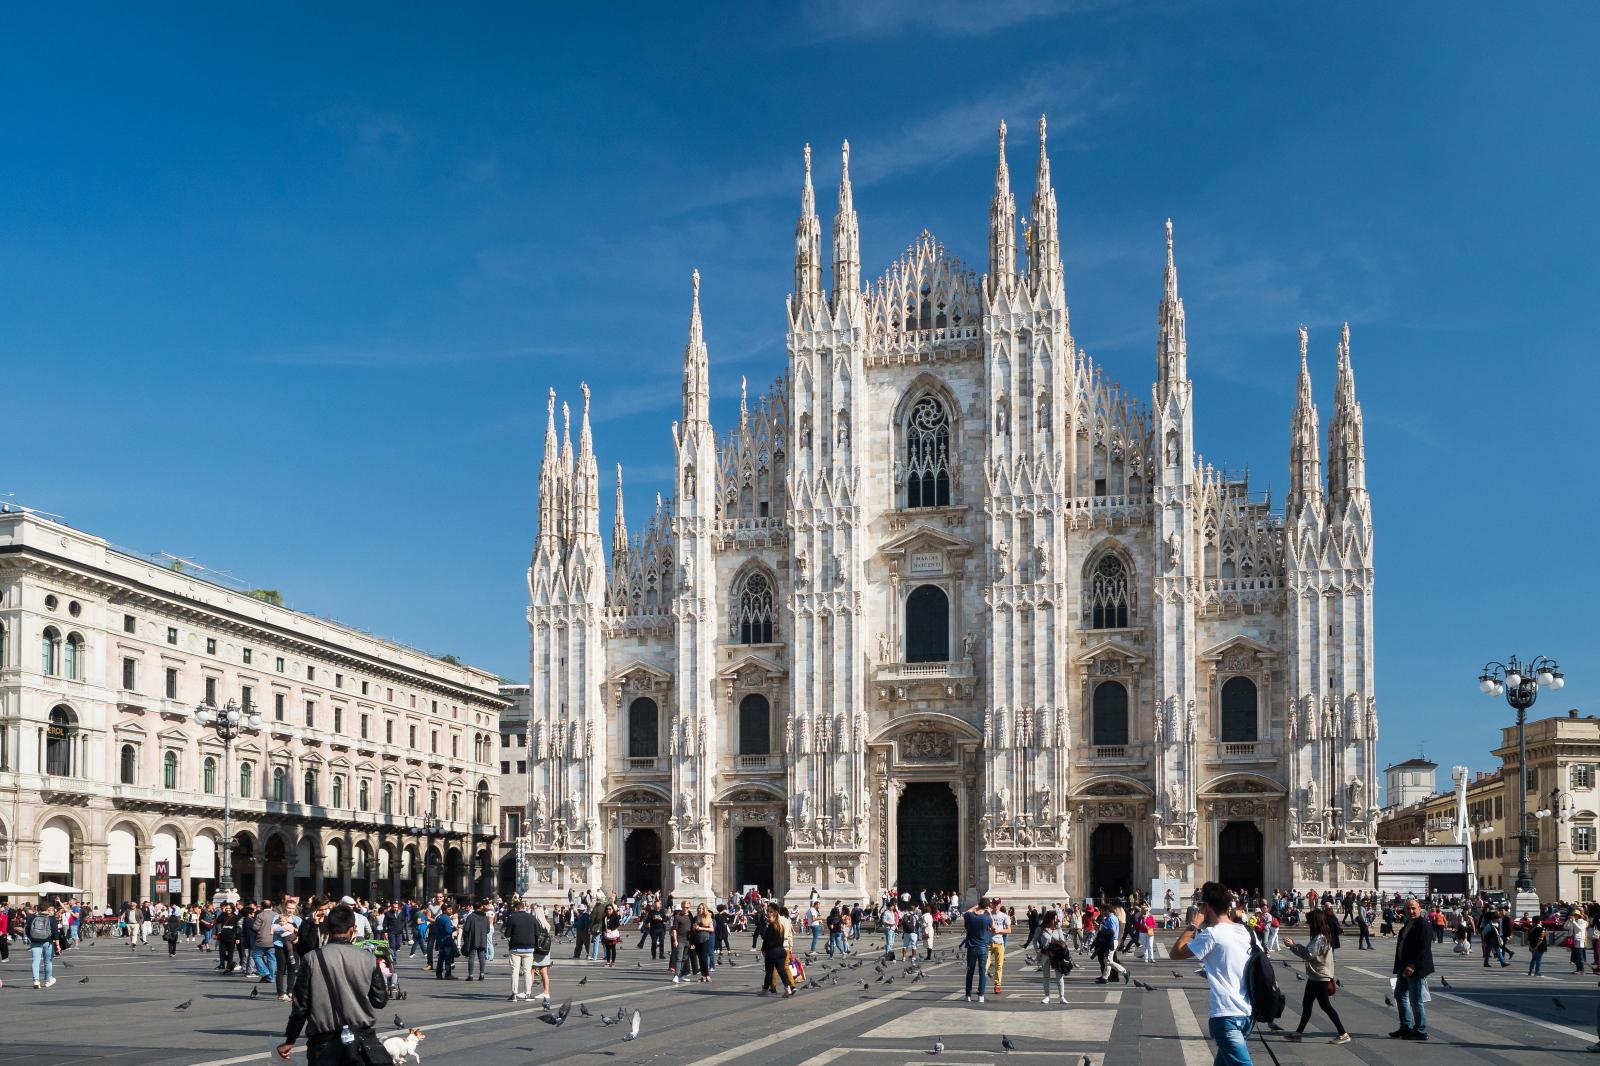 Mailänder Dom (Duomo di Milano)